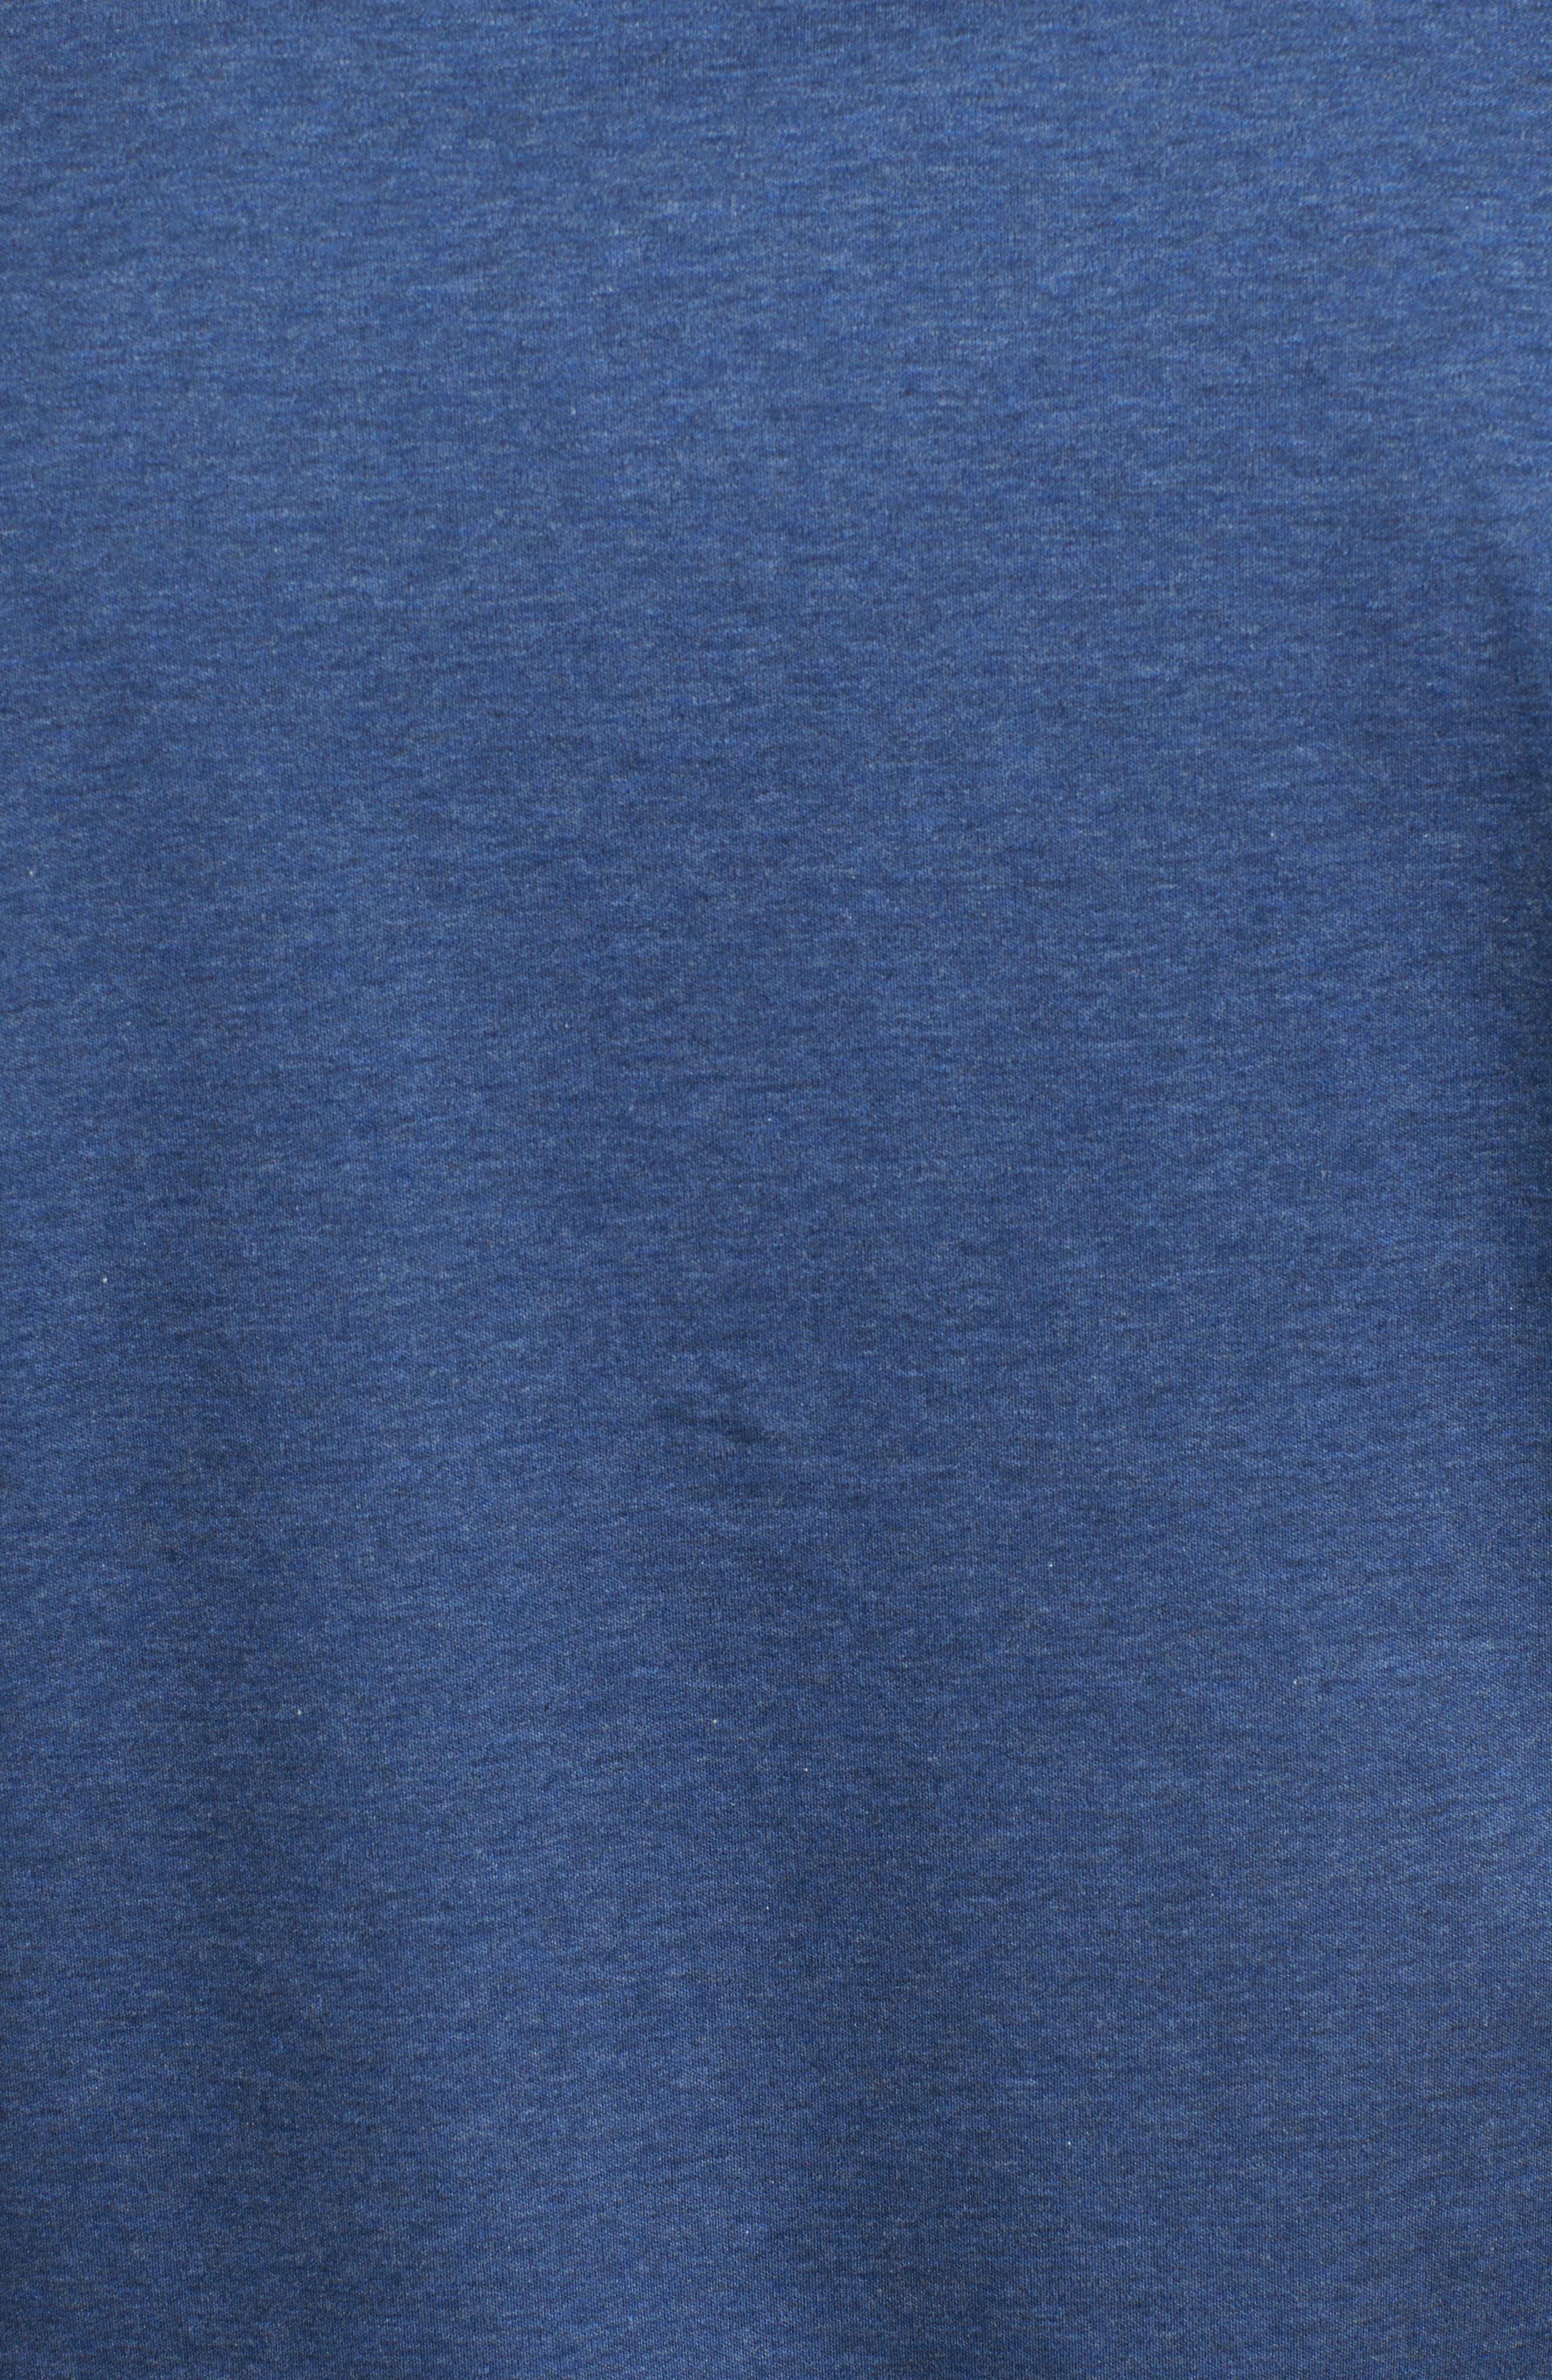 Regular Fit Heather Knit Sport Shirt,                             Alternate thumbnail 5, color,                             NAVY